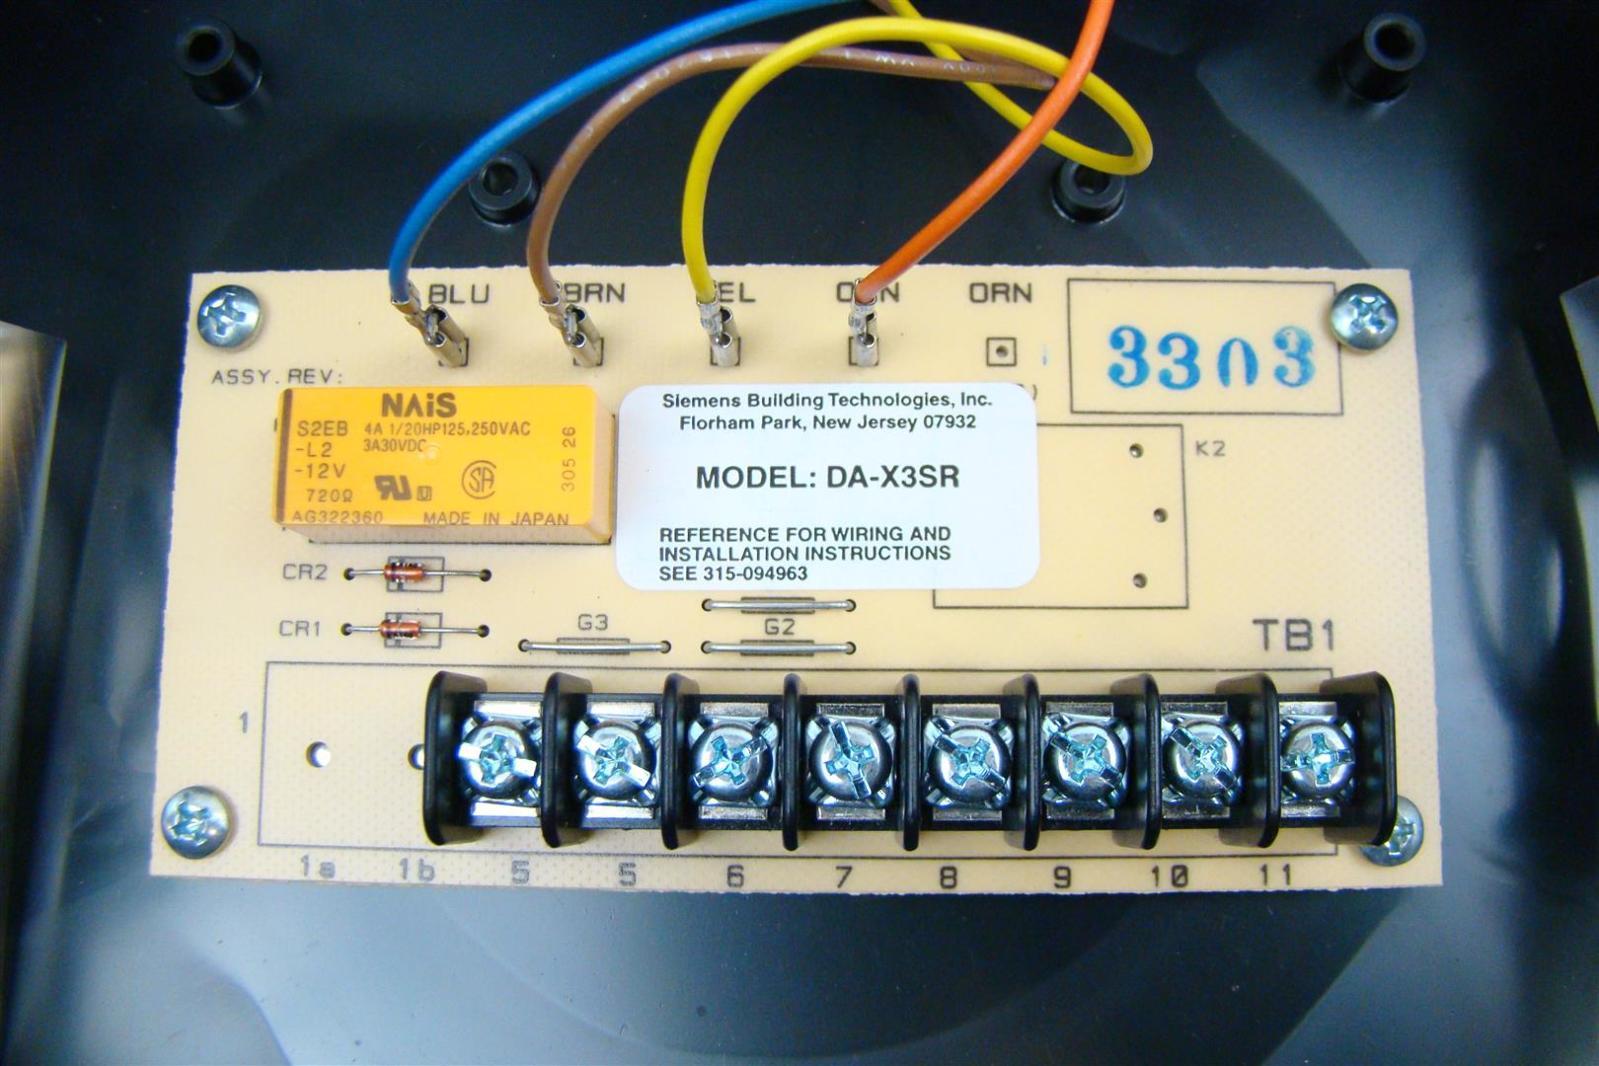 akc147 siemens detector base adapter fp 11 fs dp da x3sr db adpt 6?resize\=665%2C443 siemens smoke duct detector wiring diagram siemens ad2 p \u2022 45 63 74 91 Siemens 540 100 Wiring Diagrams at readyjetset.co